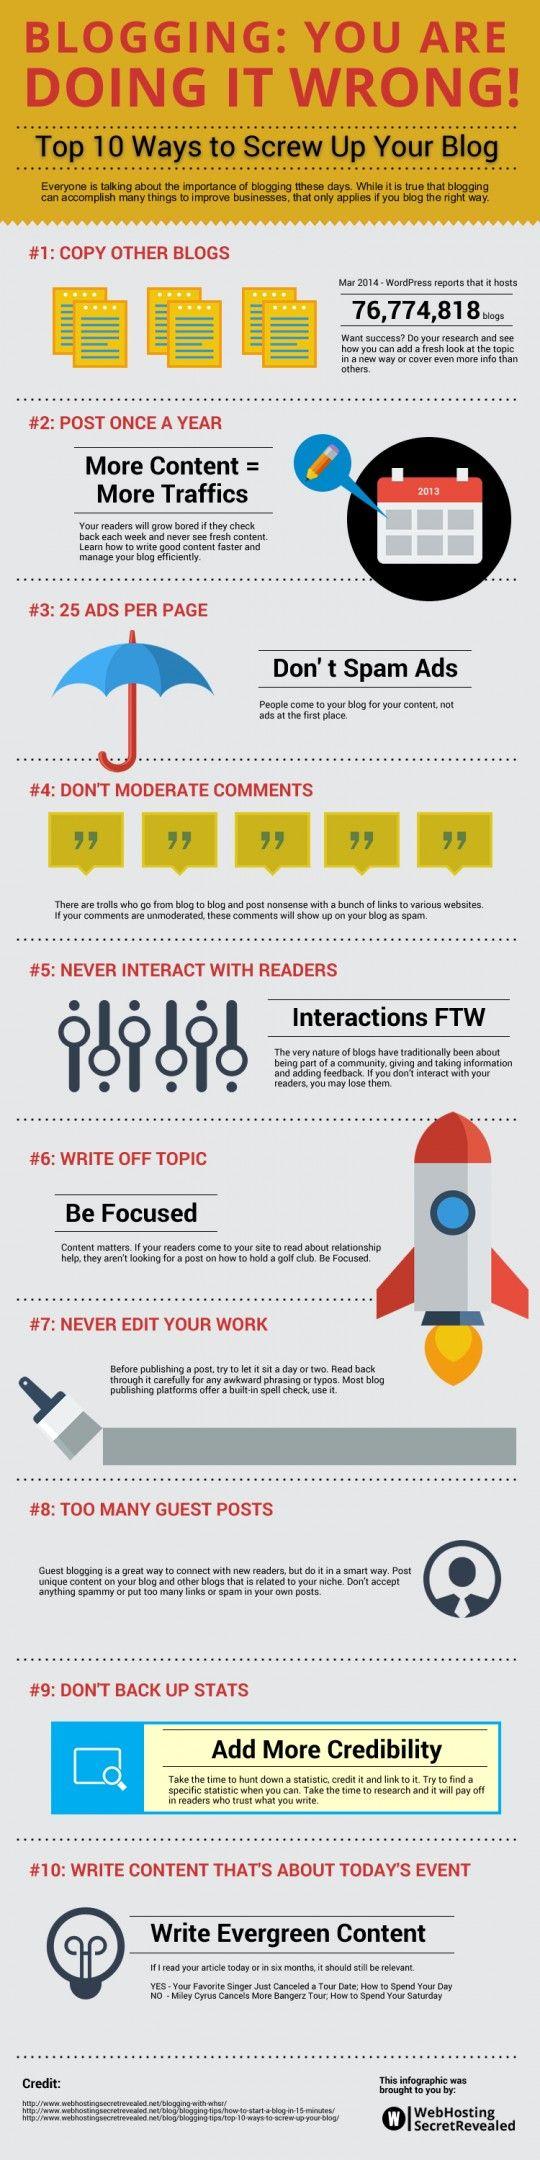 Top 10 Ways To Screw Up Your Blog. #SocialMedia #BloggingTips